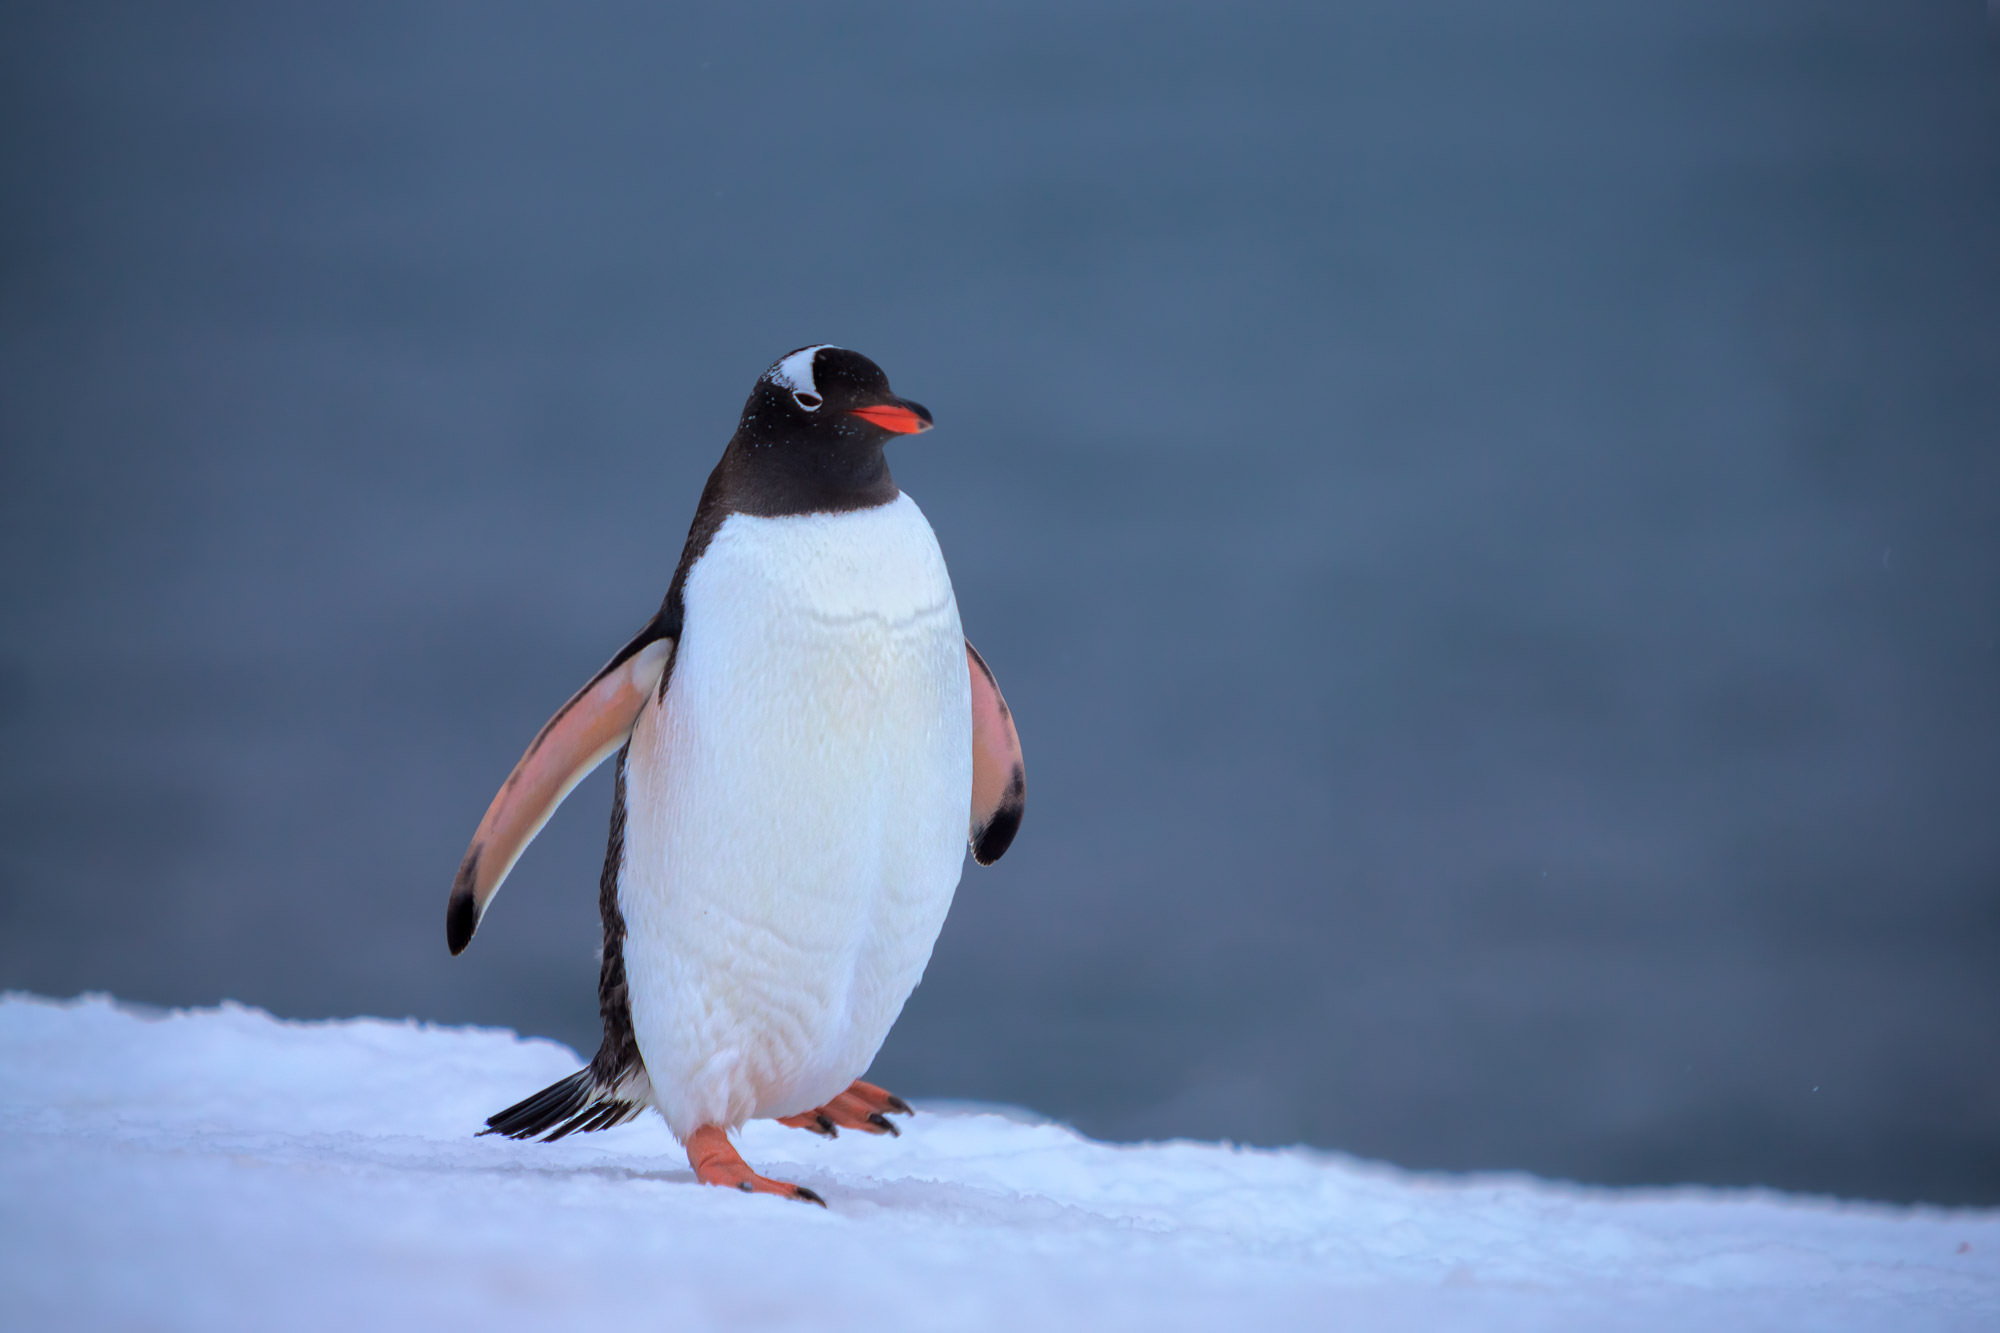 Penguin, Antarctica, Gentoo, limited edition, photograph, fine art, wildlife, photo